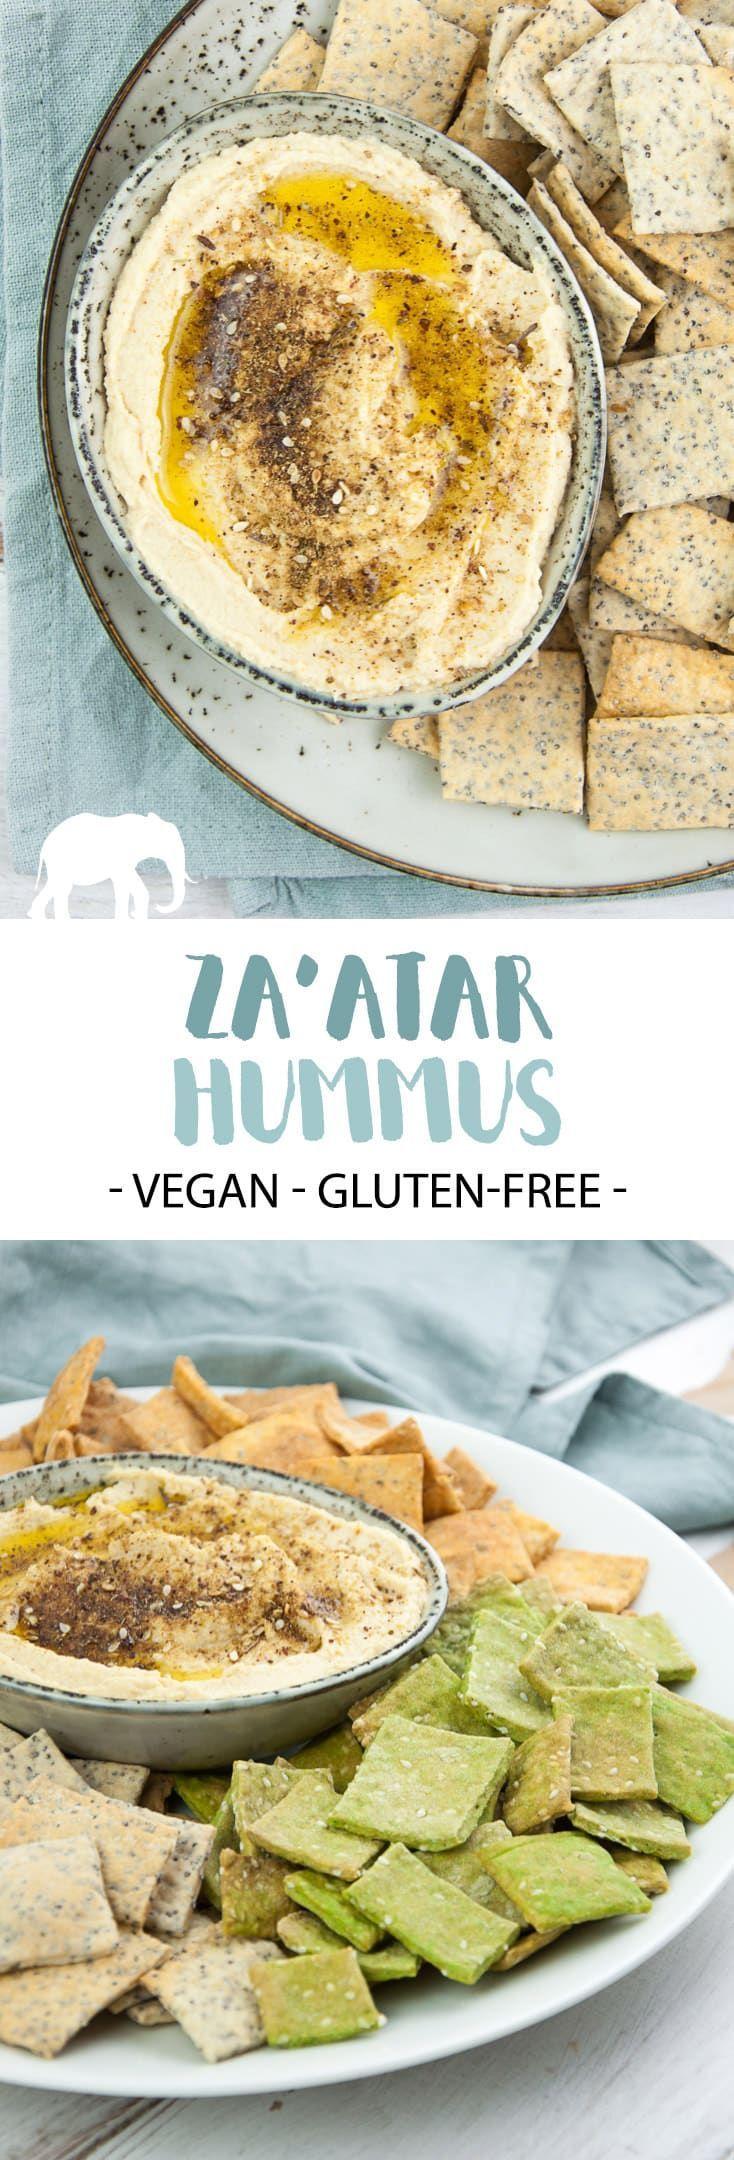 Za'atar Hummus – Creamy Hummus topped with olive oil and Za'atar seasoning. Deli…